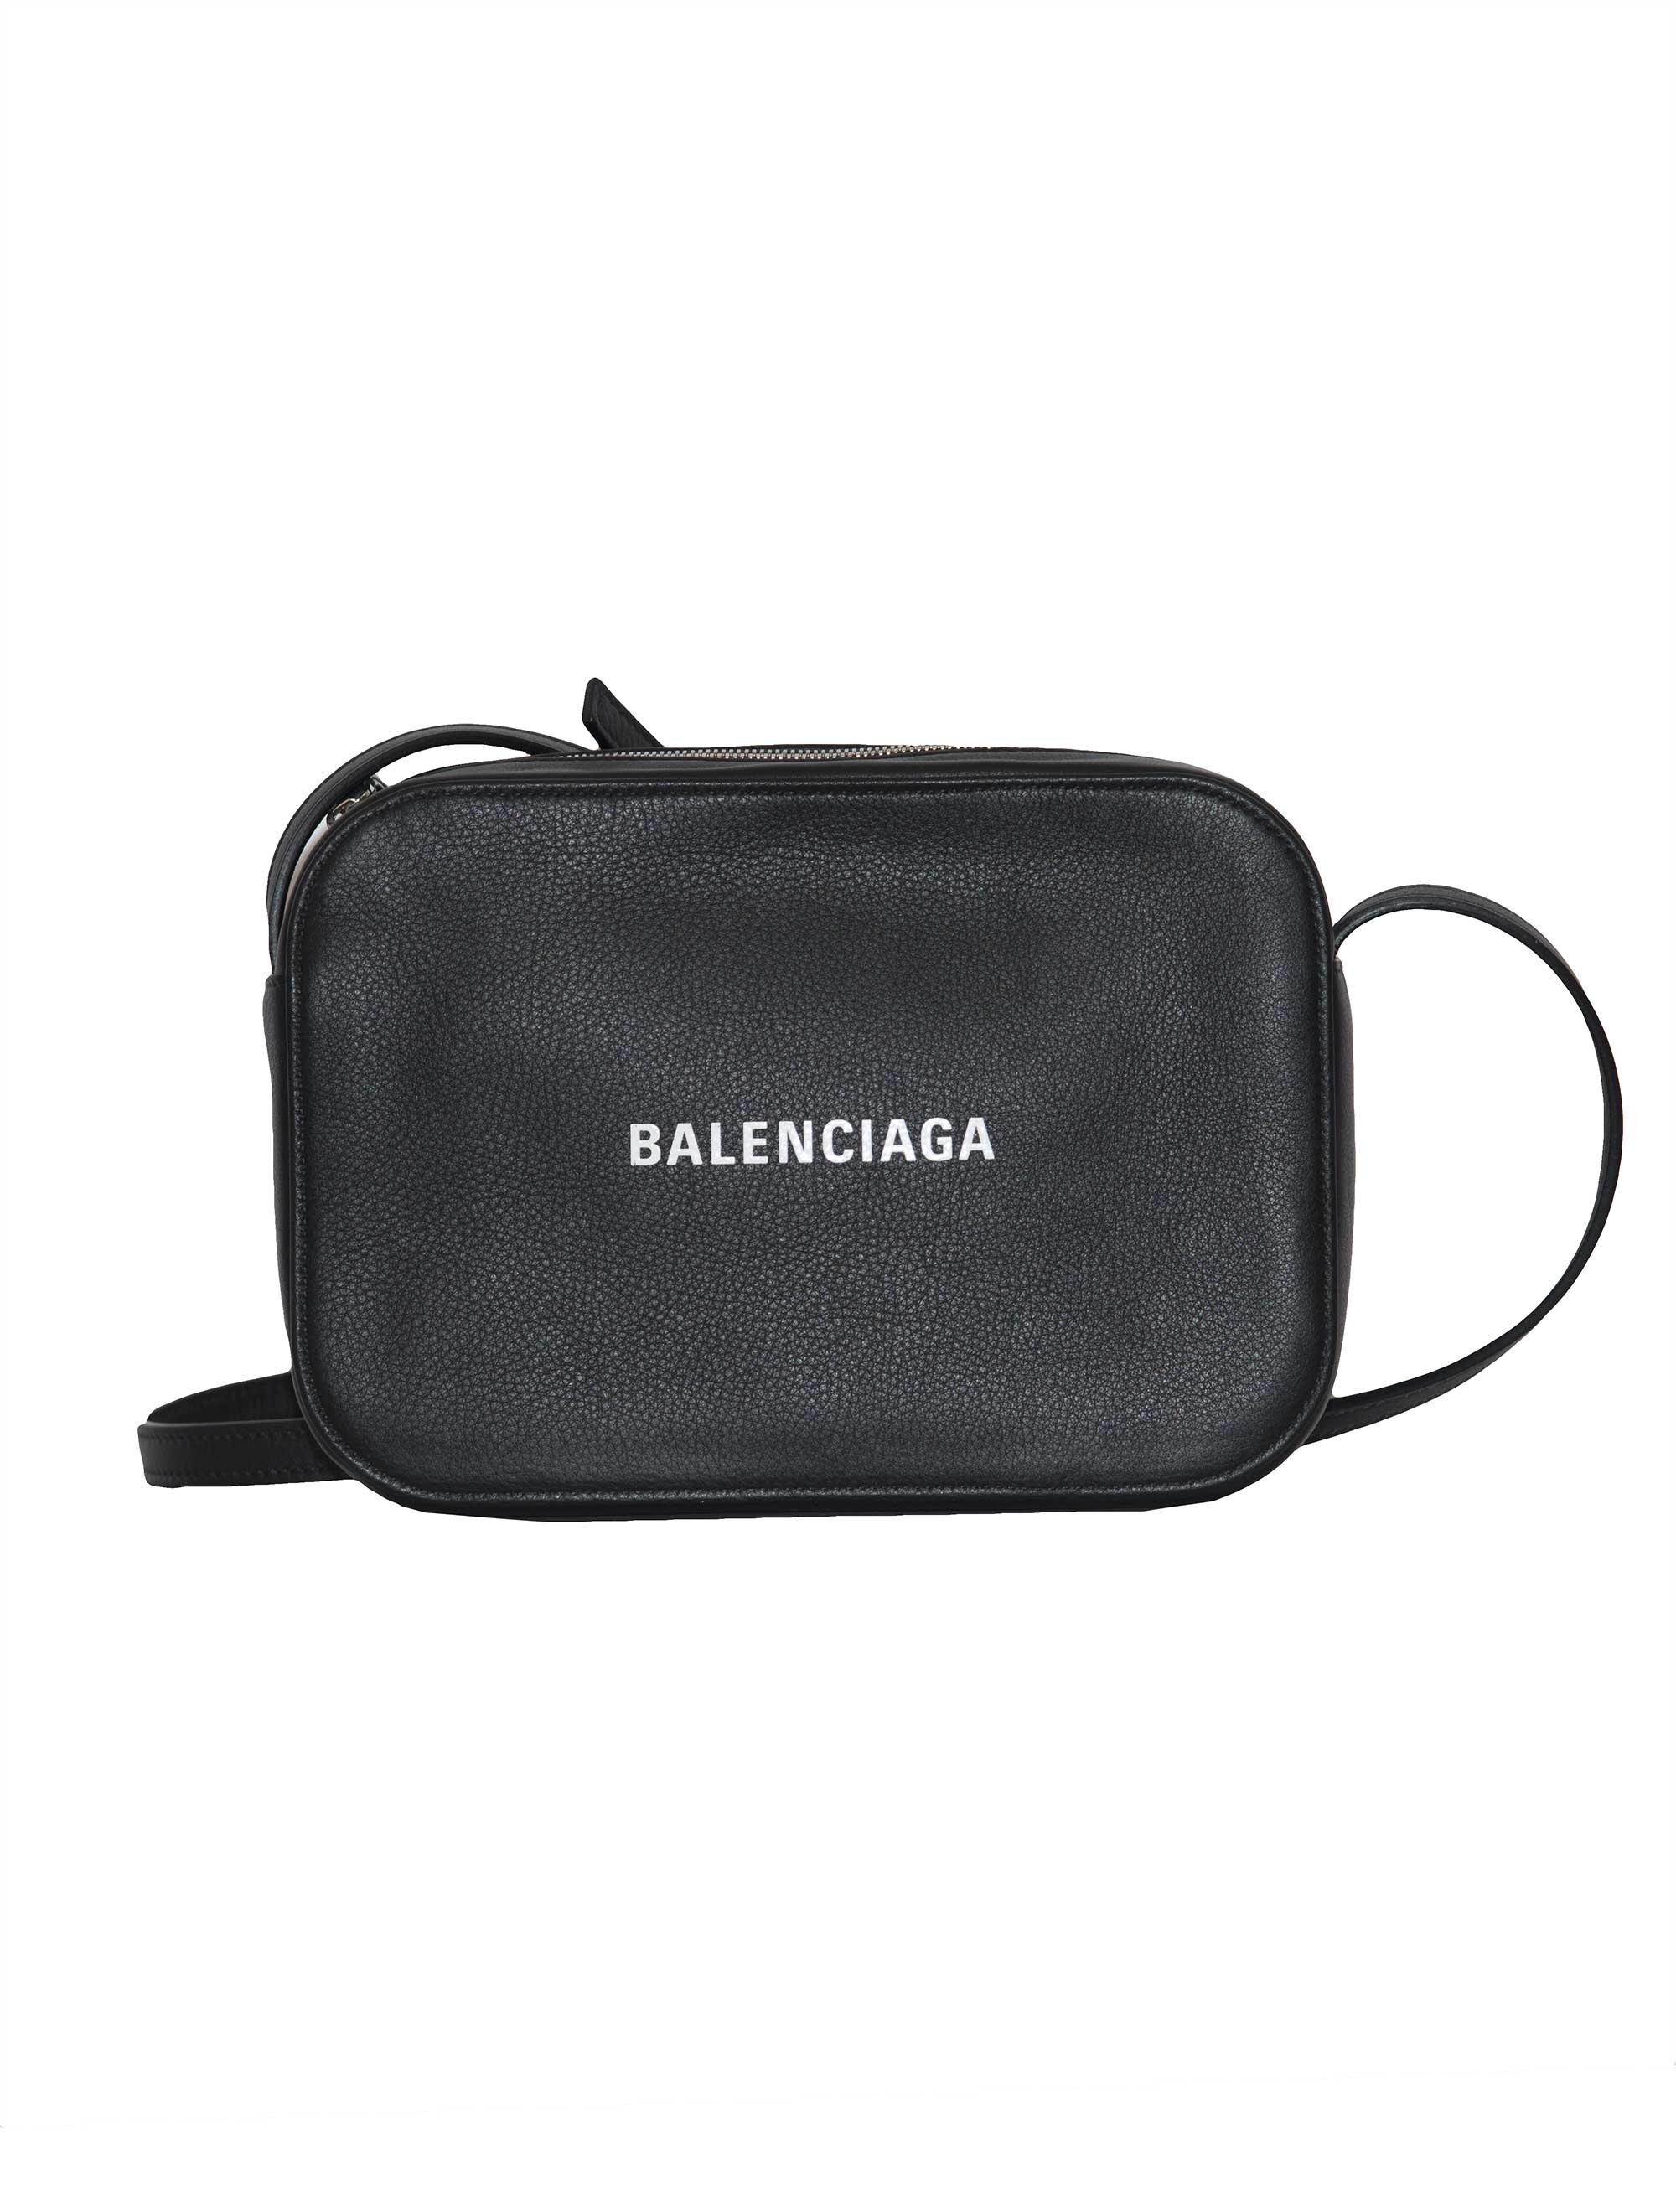 Picture of Balenciaga | Everyday Camera Bag S